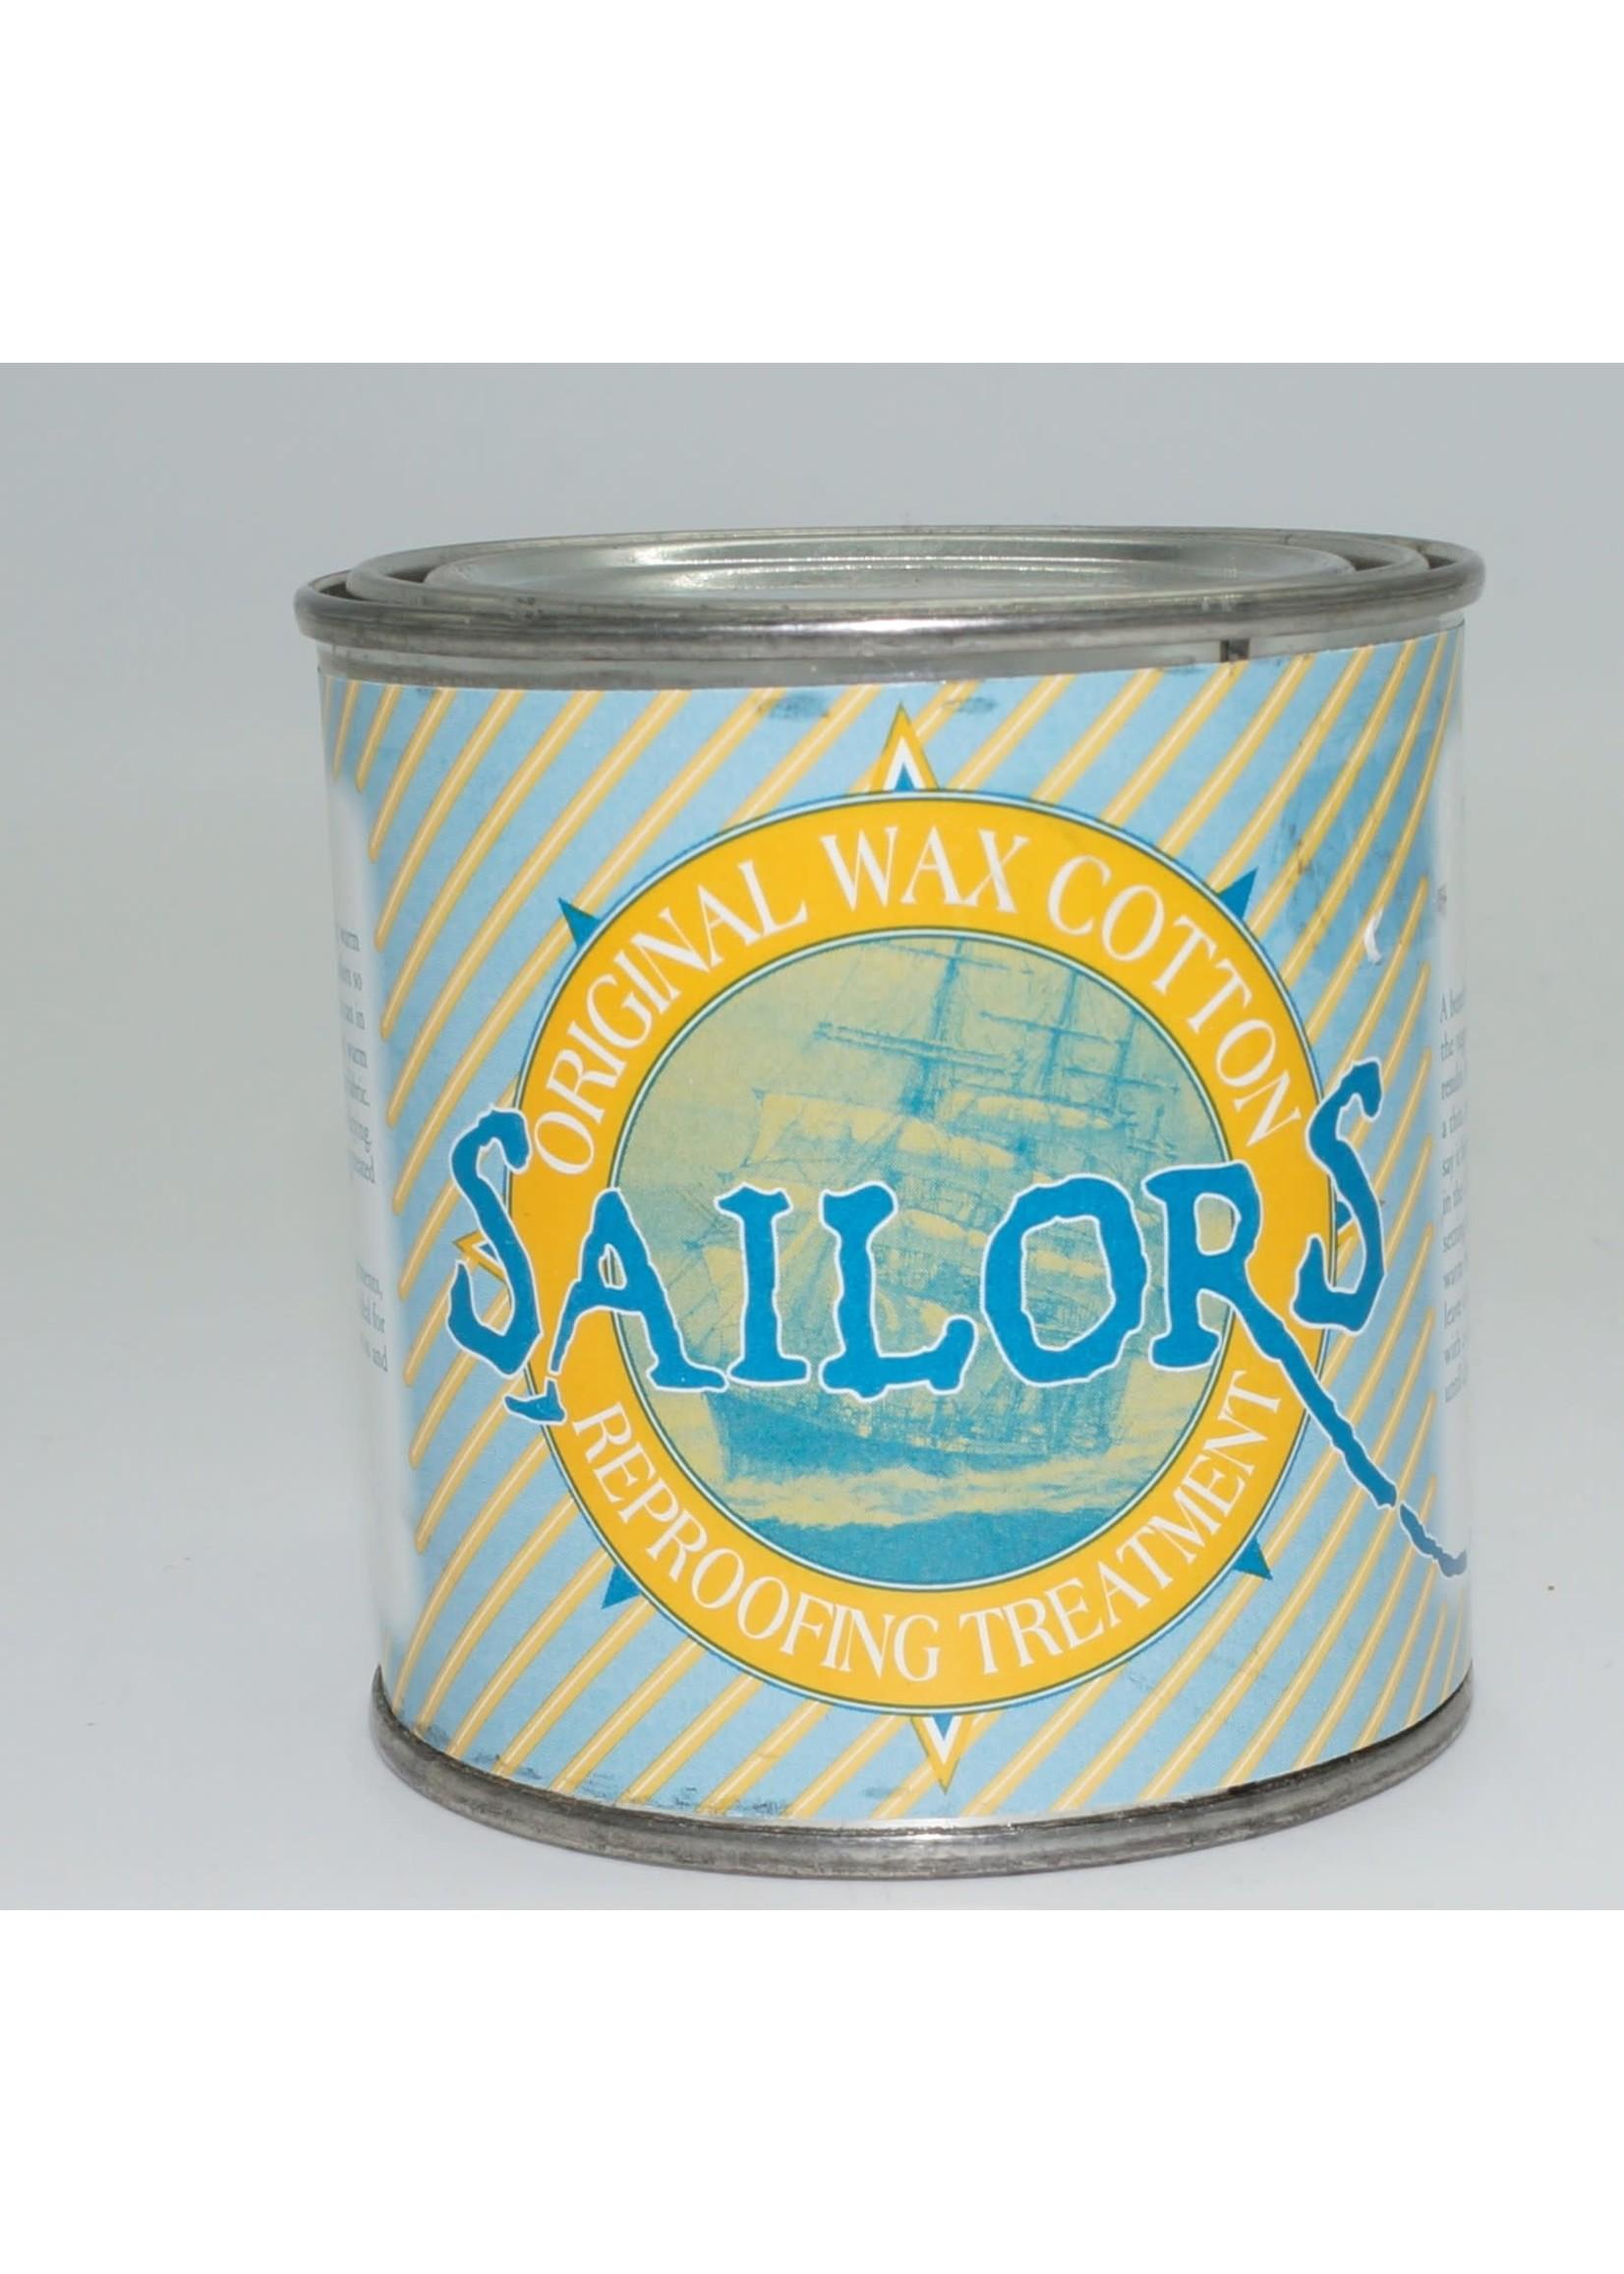 Sailors / Duster Oil / 8oz